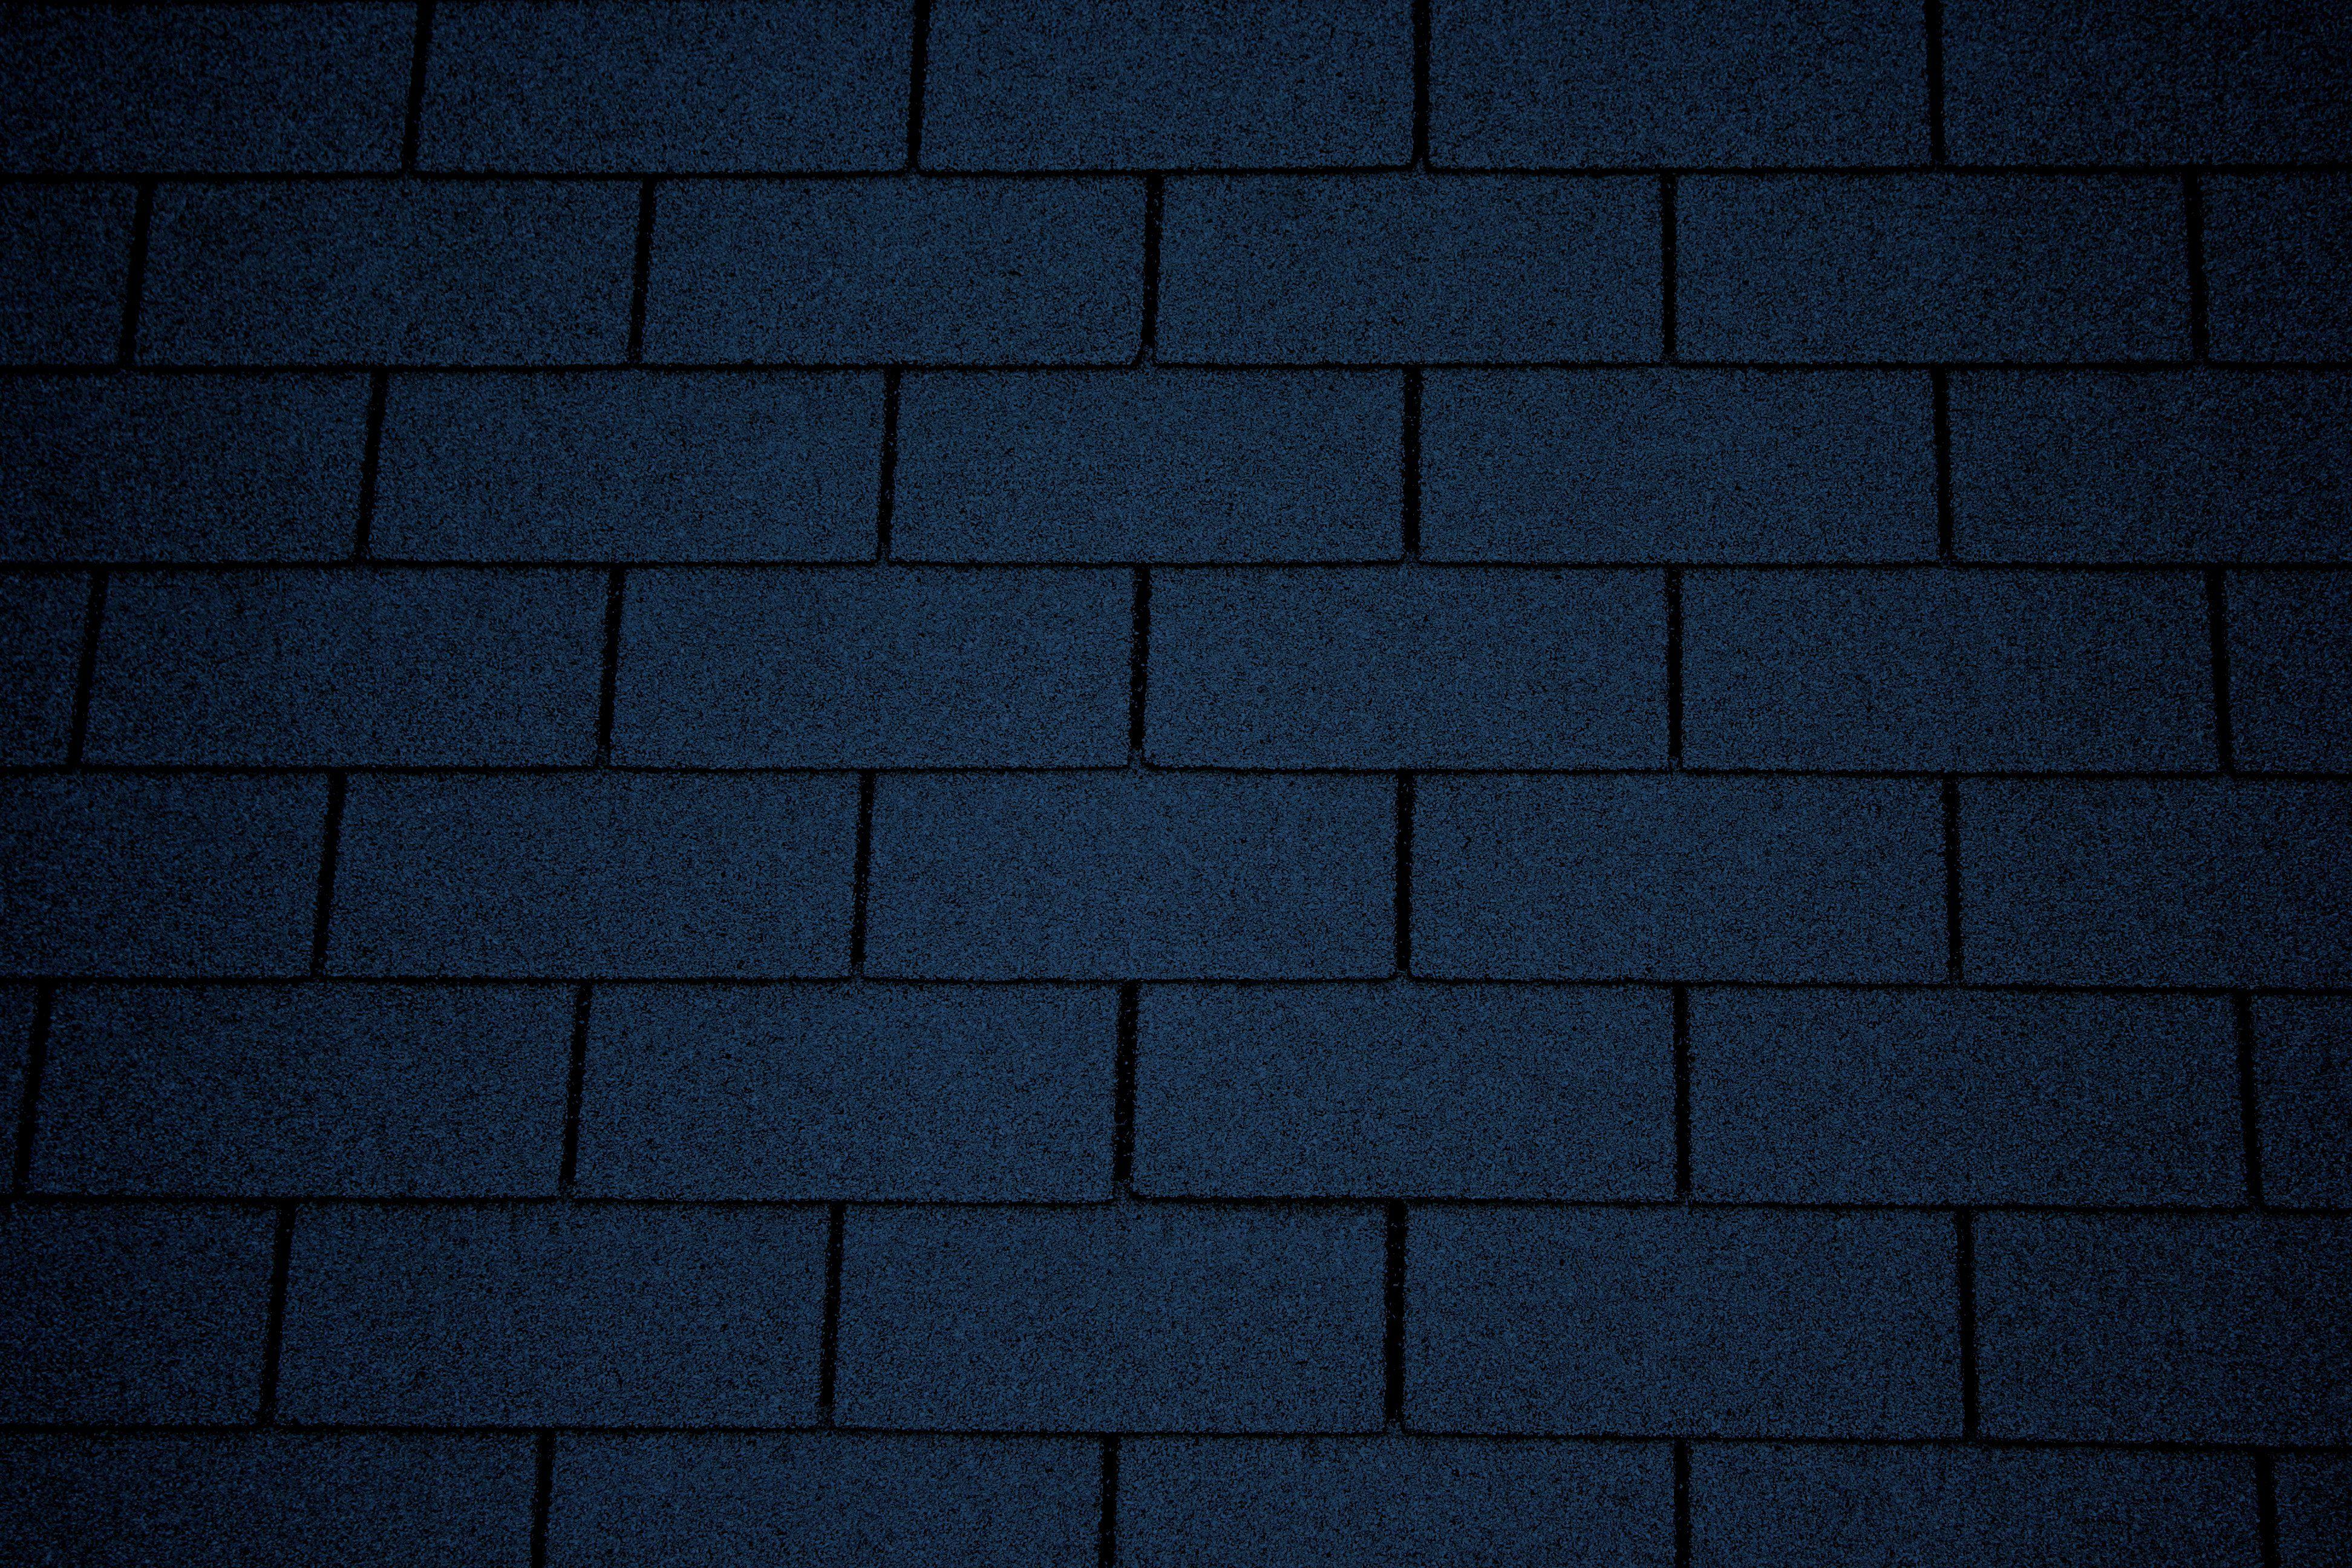 Best Dark Blue Asphalt Roof Shingles Texture Jpg 3888×2592 400 x 300